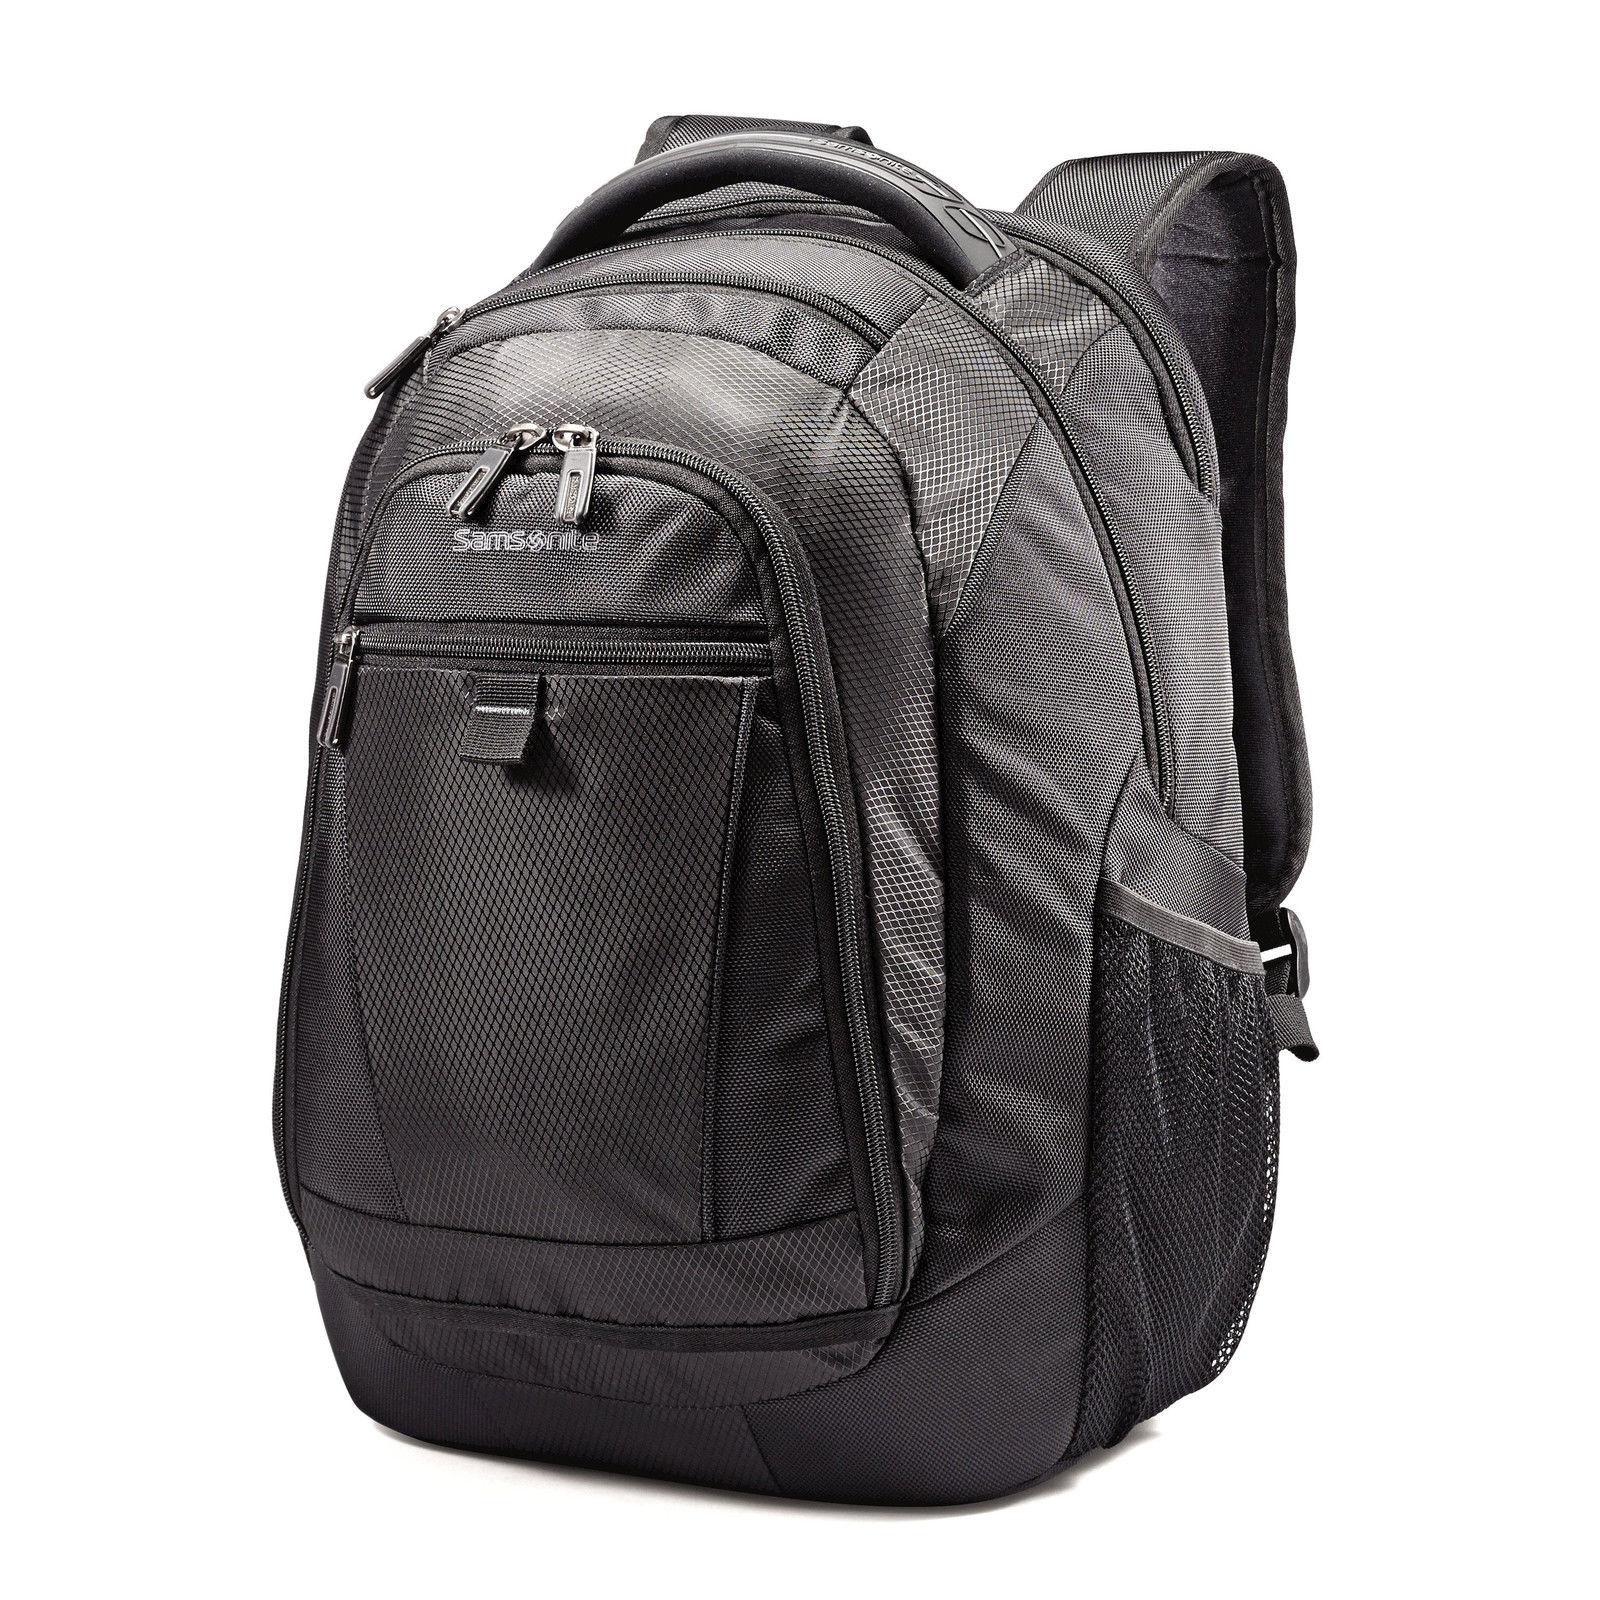 Samsonite Tectonic 2 Medium Backpack $34.99 @ebay